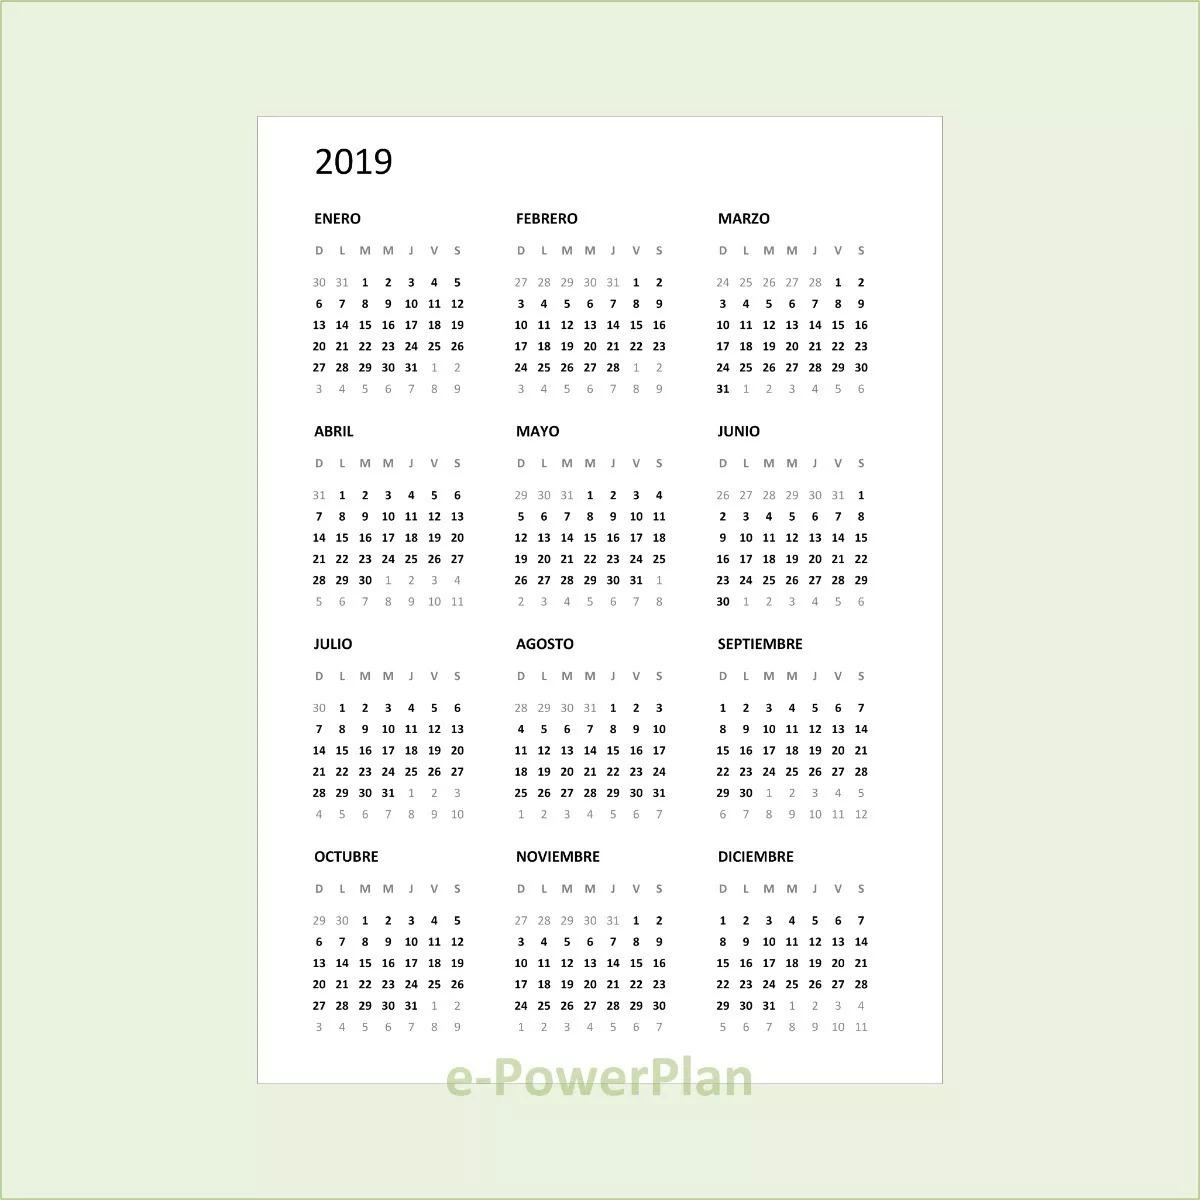 Calendario 2019 Para Imprimir.Calendario 2019 Pdf A6 Para Imprimir